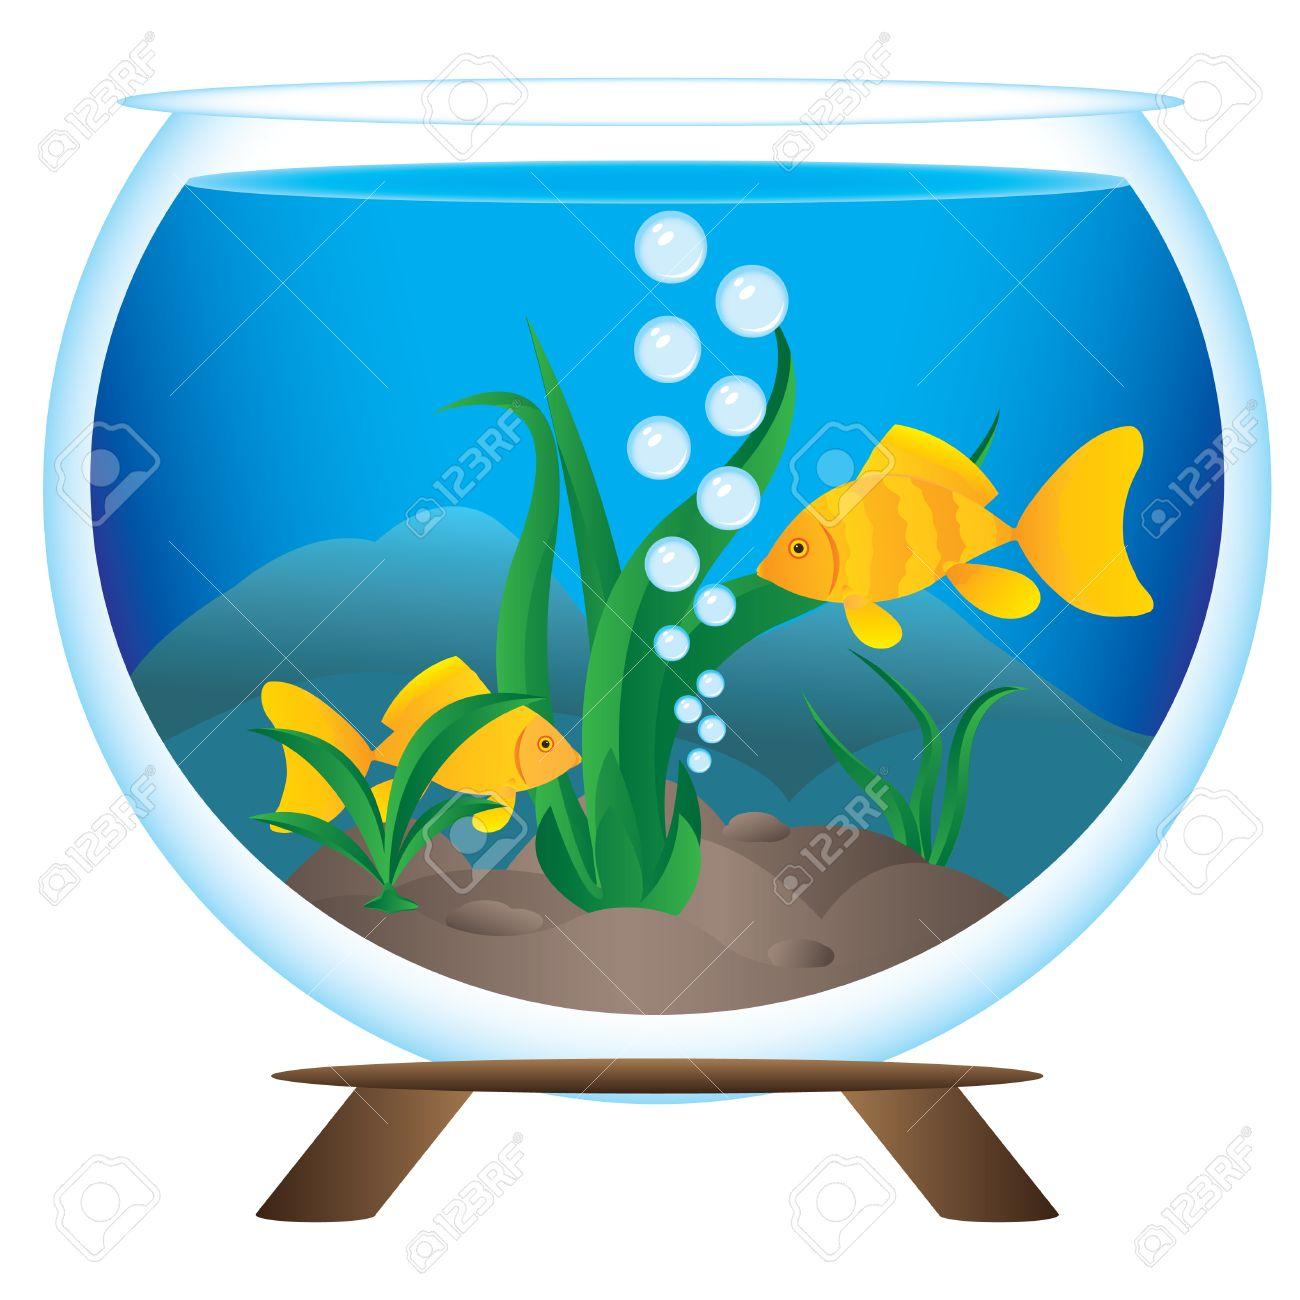 Fish tank clipart - Fish Clip Art Of Plants